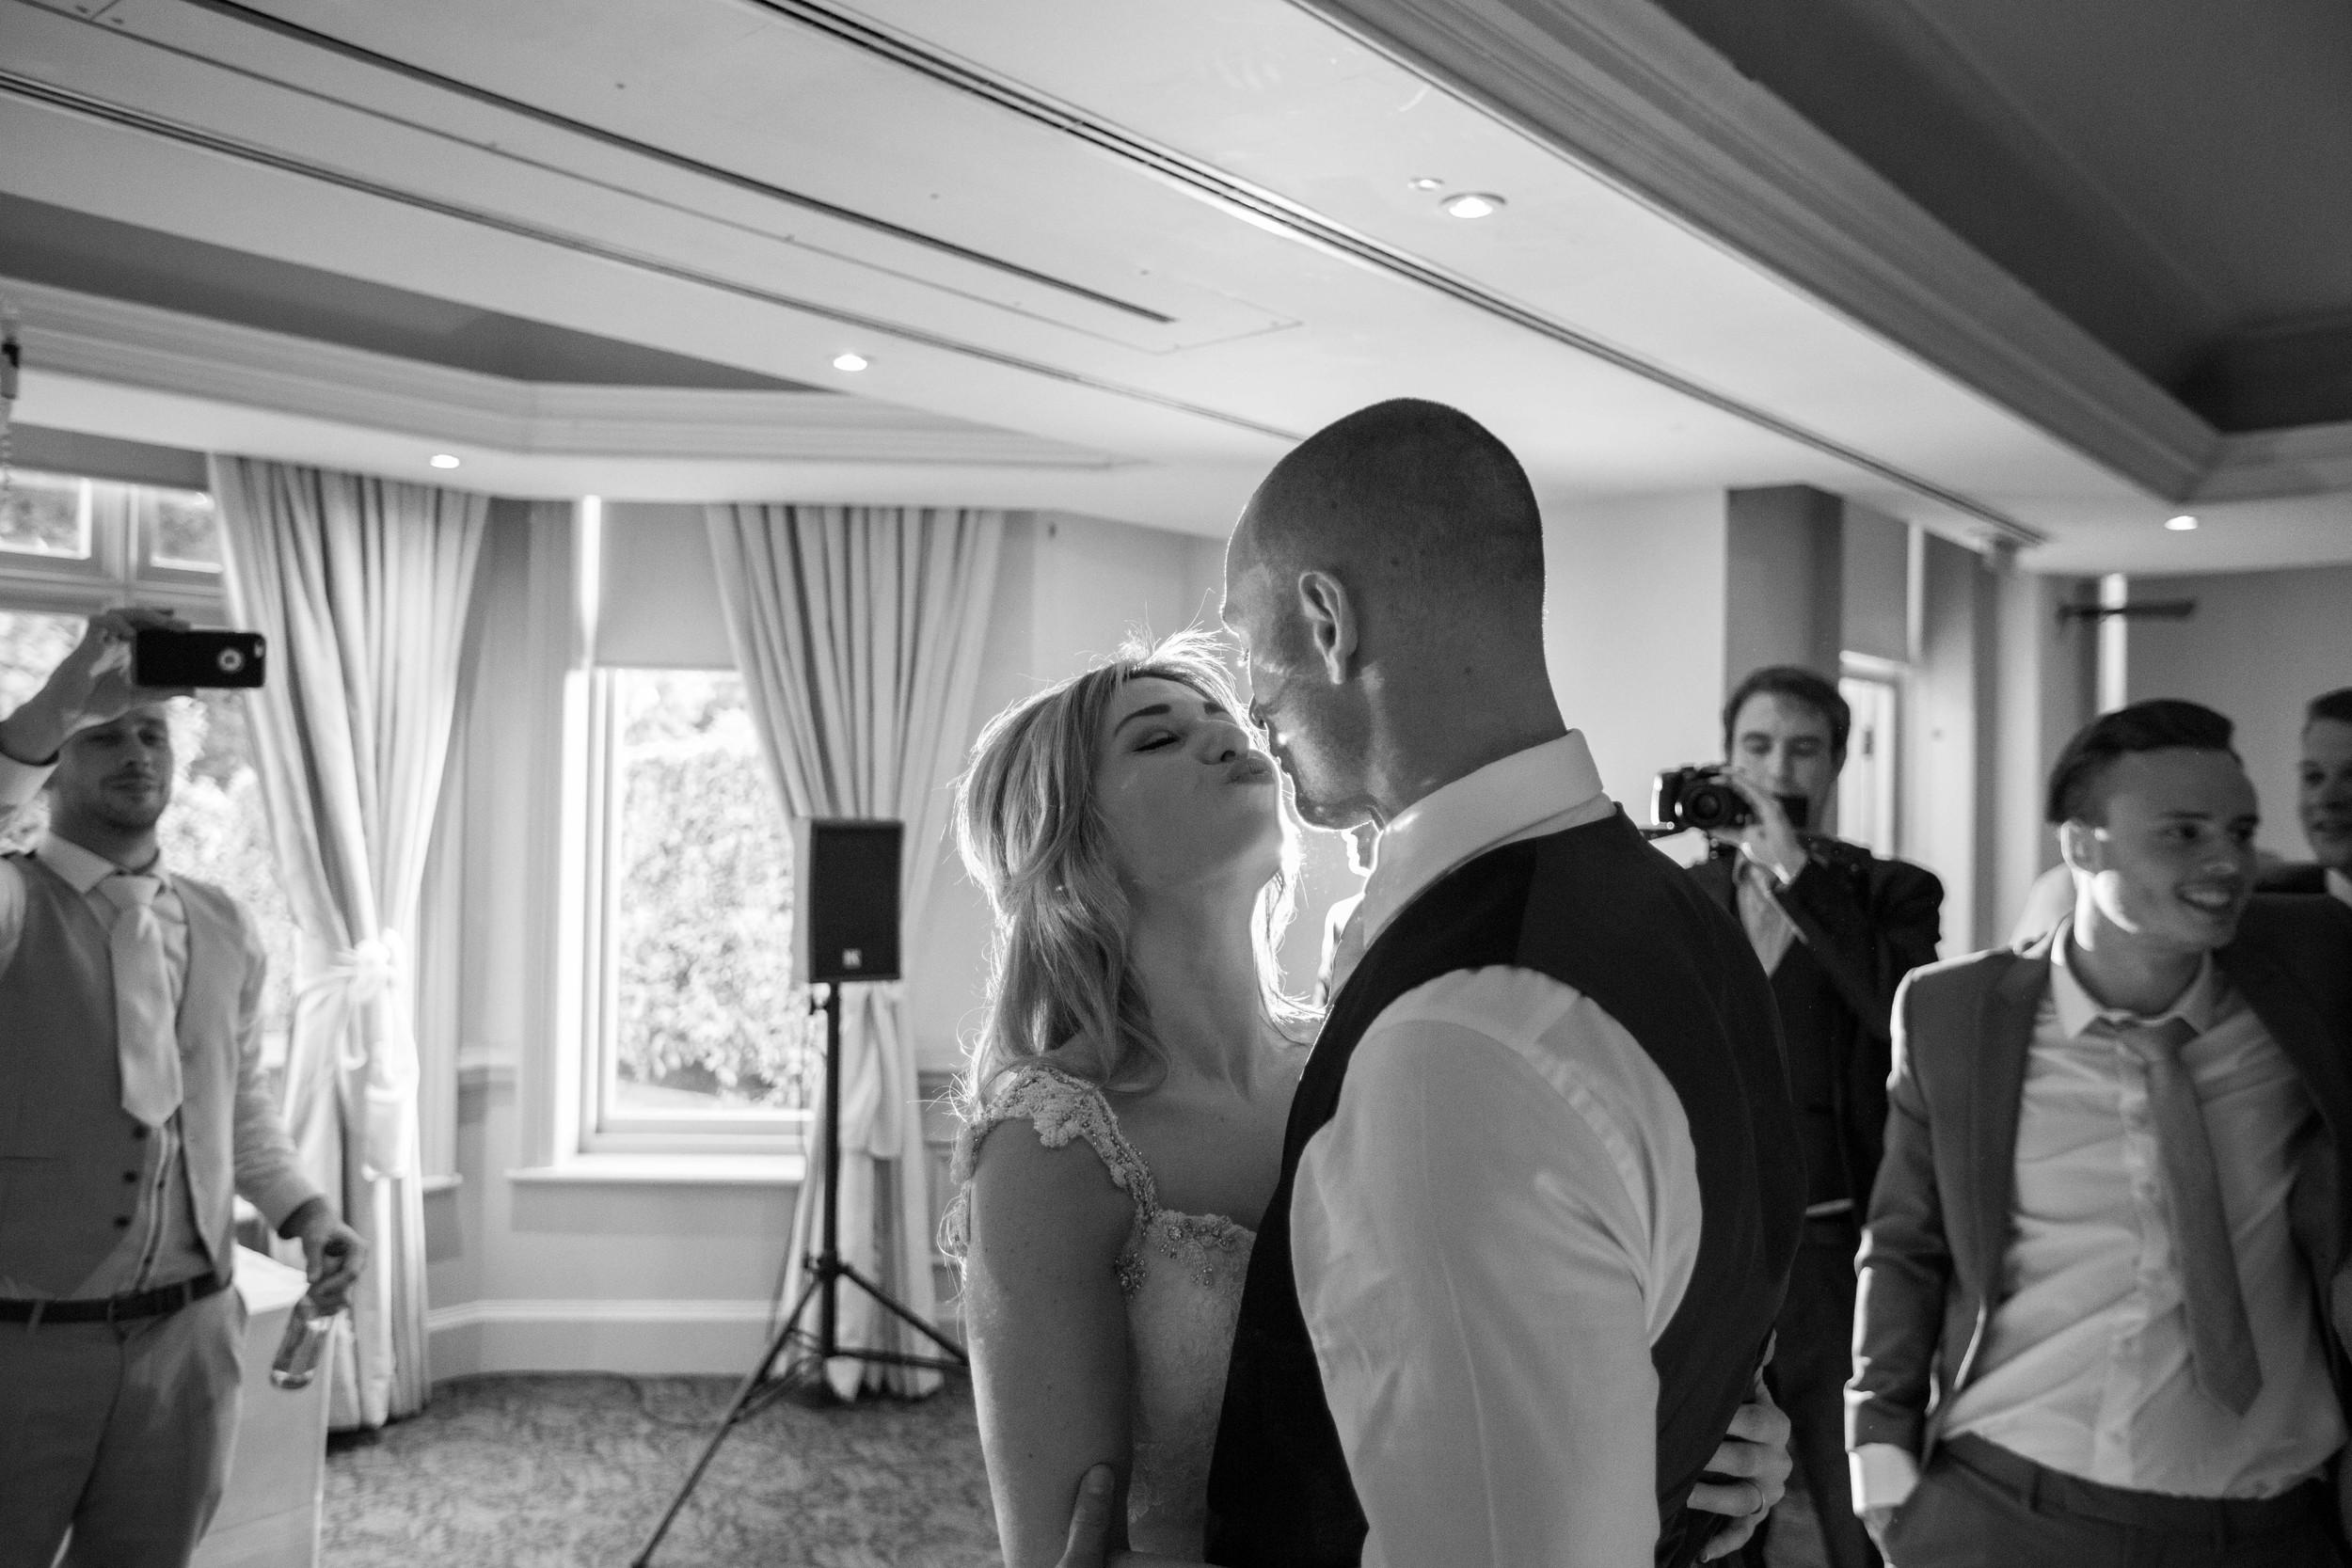 Woodlands-Park-Hotel-Cobham-Surrey-wedding-38